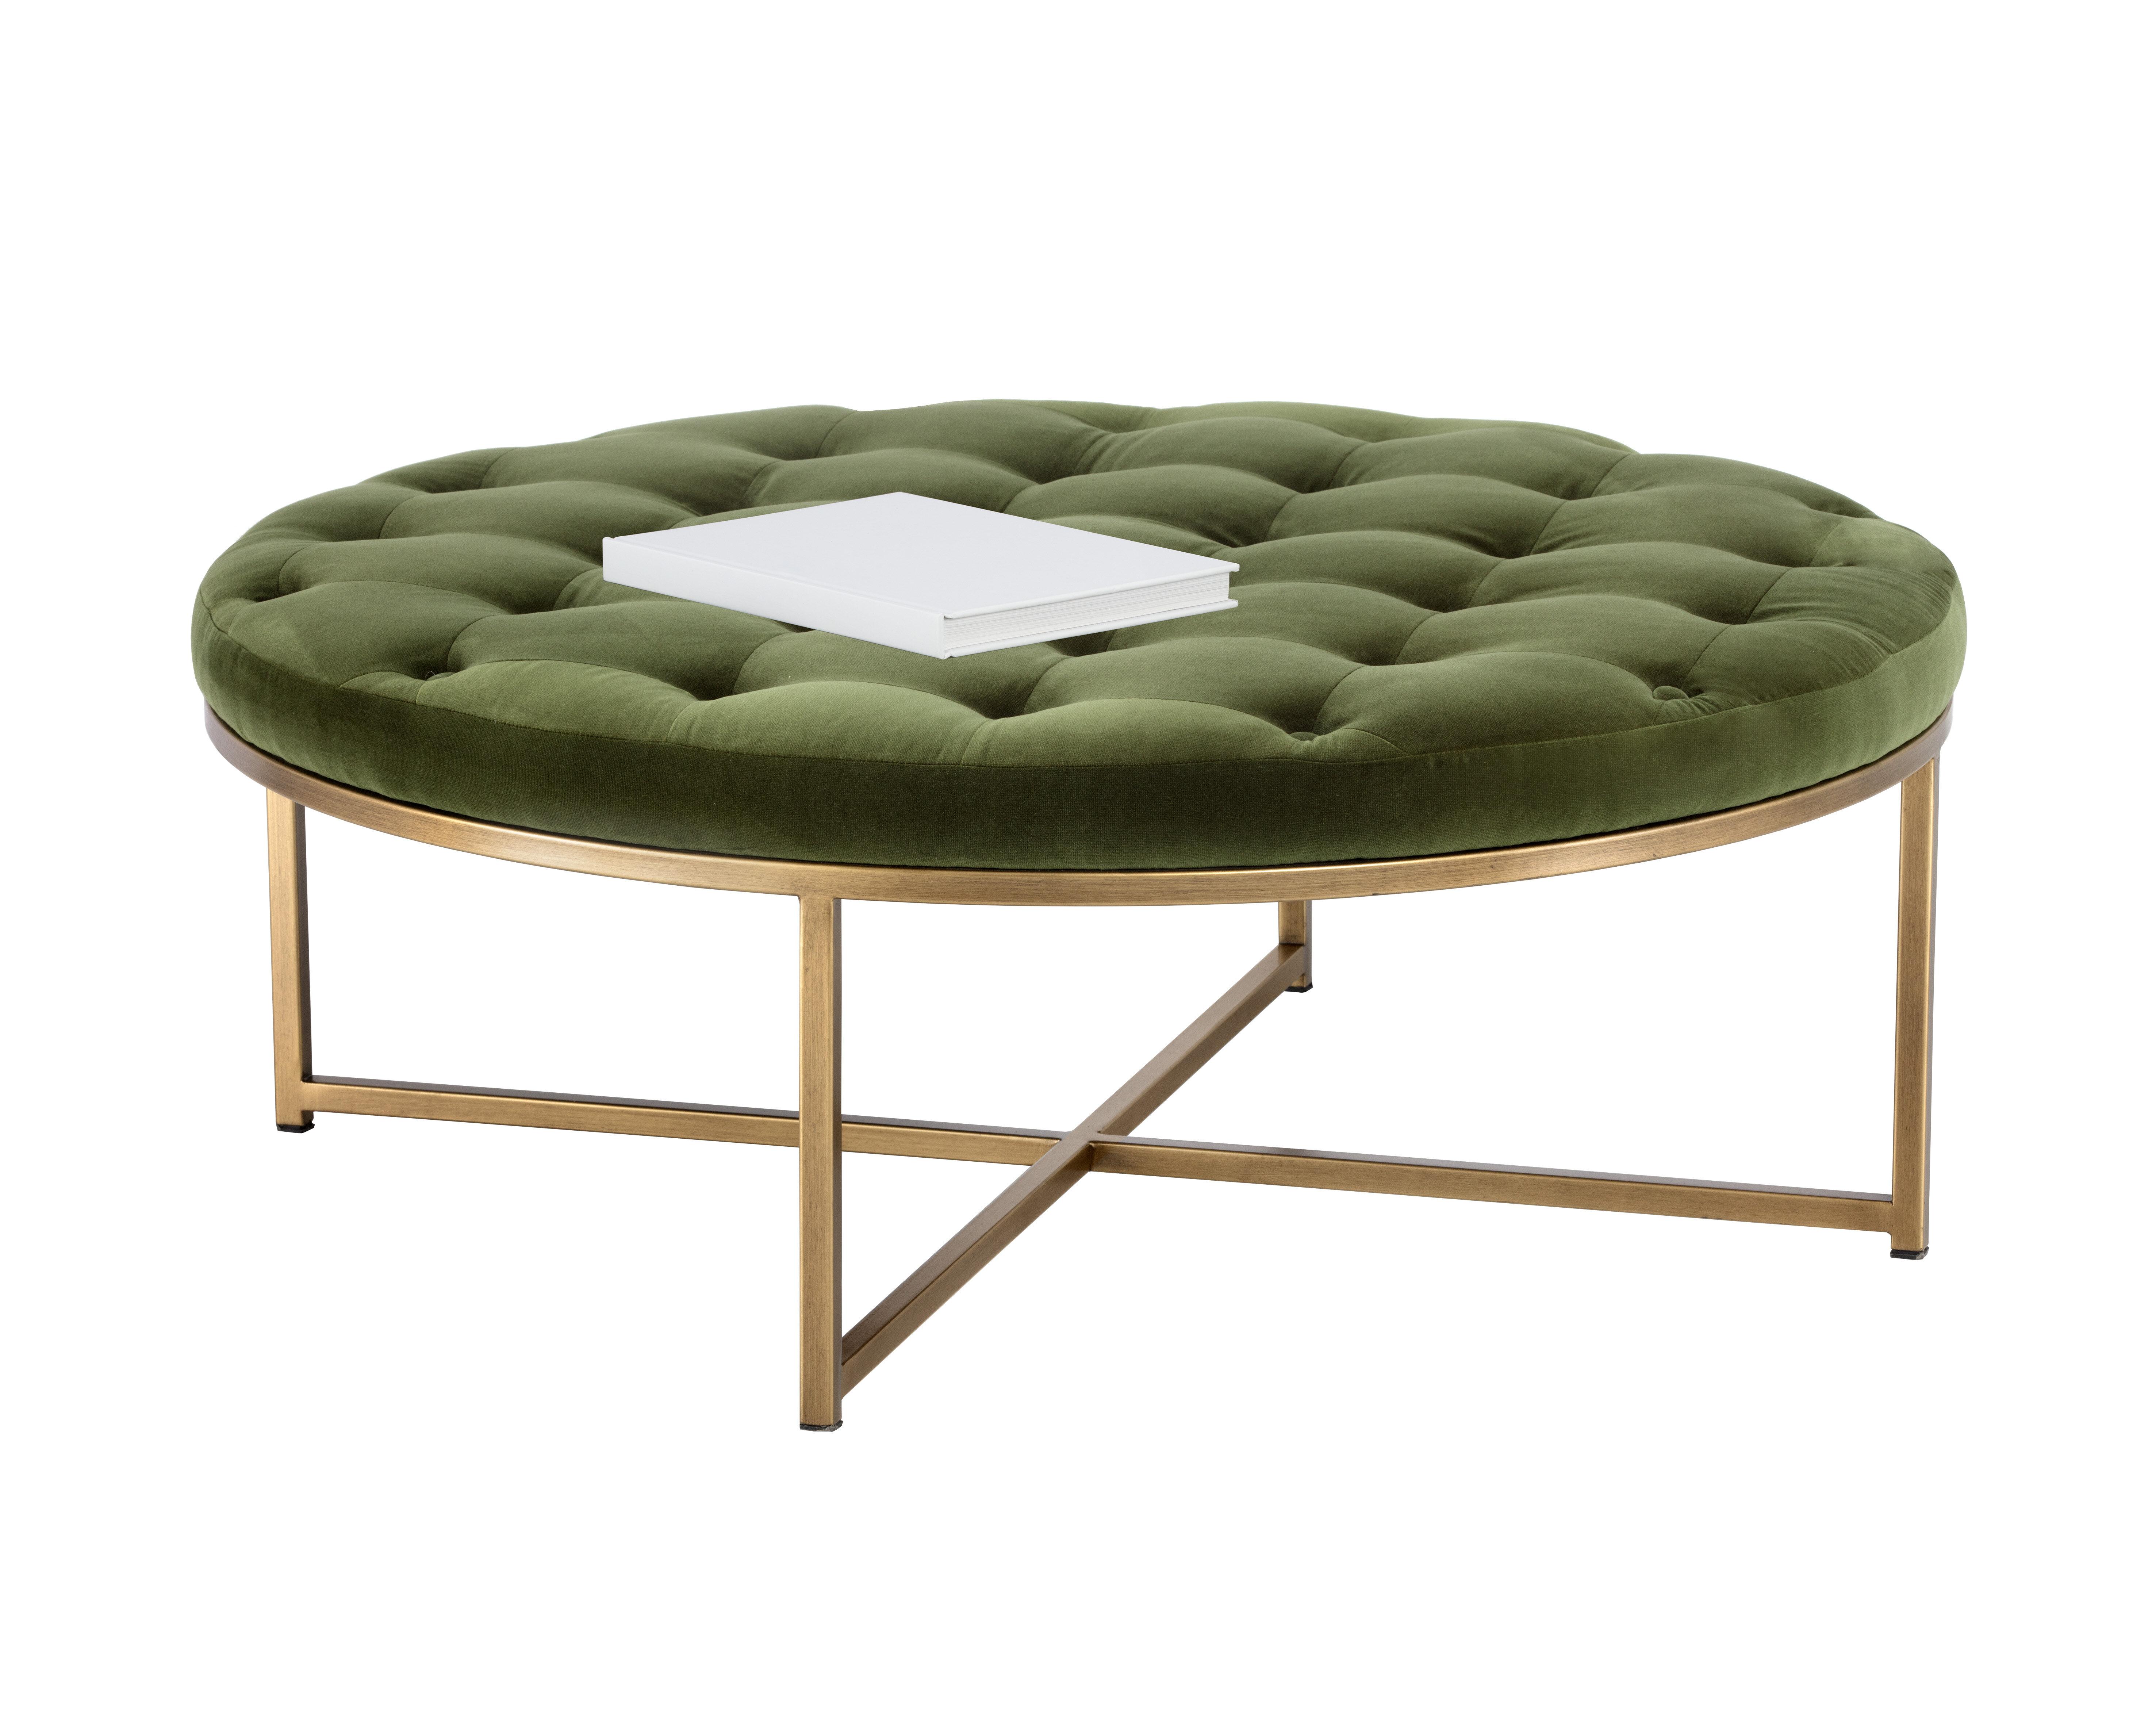 Tremendous Endall Round Tufted Ottoman Bralicious Painted Fabric Chair Ideas Braliciousco